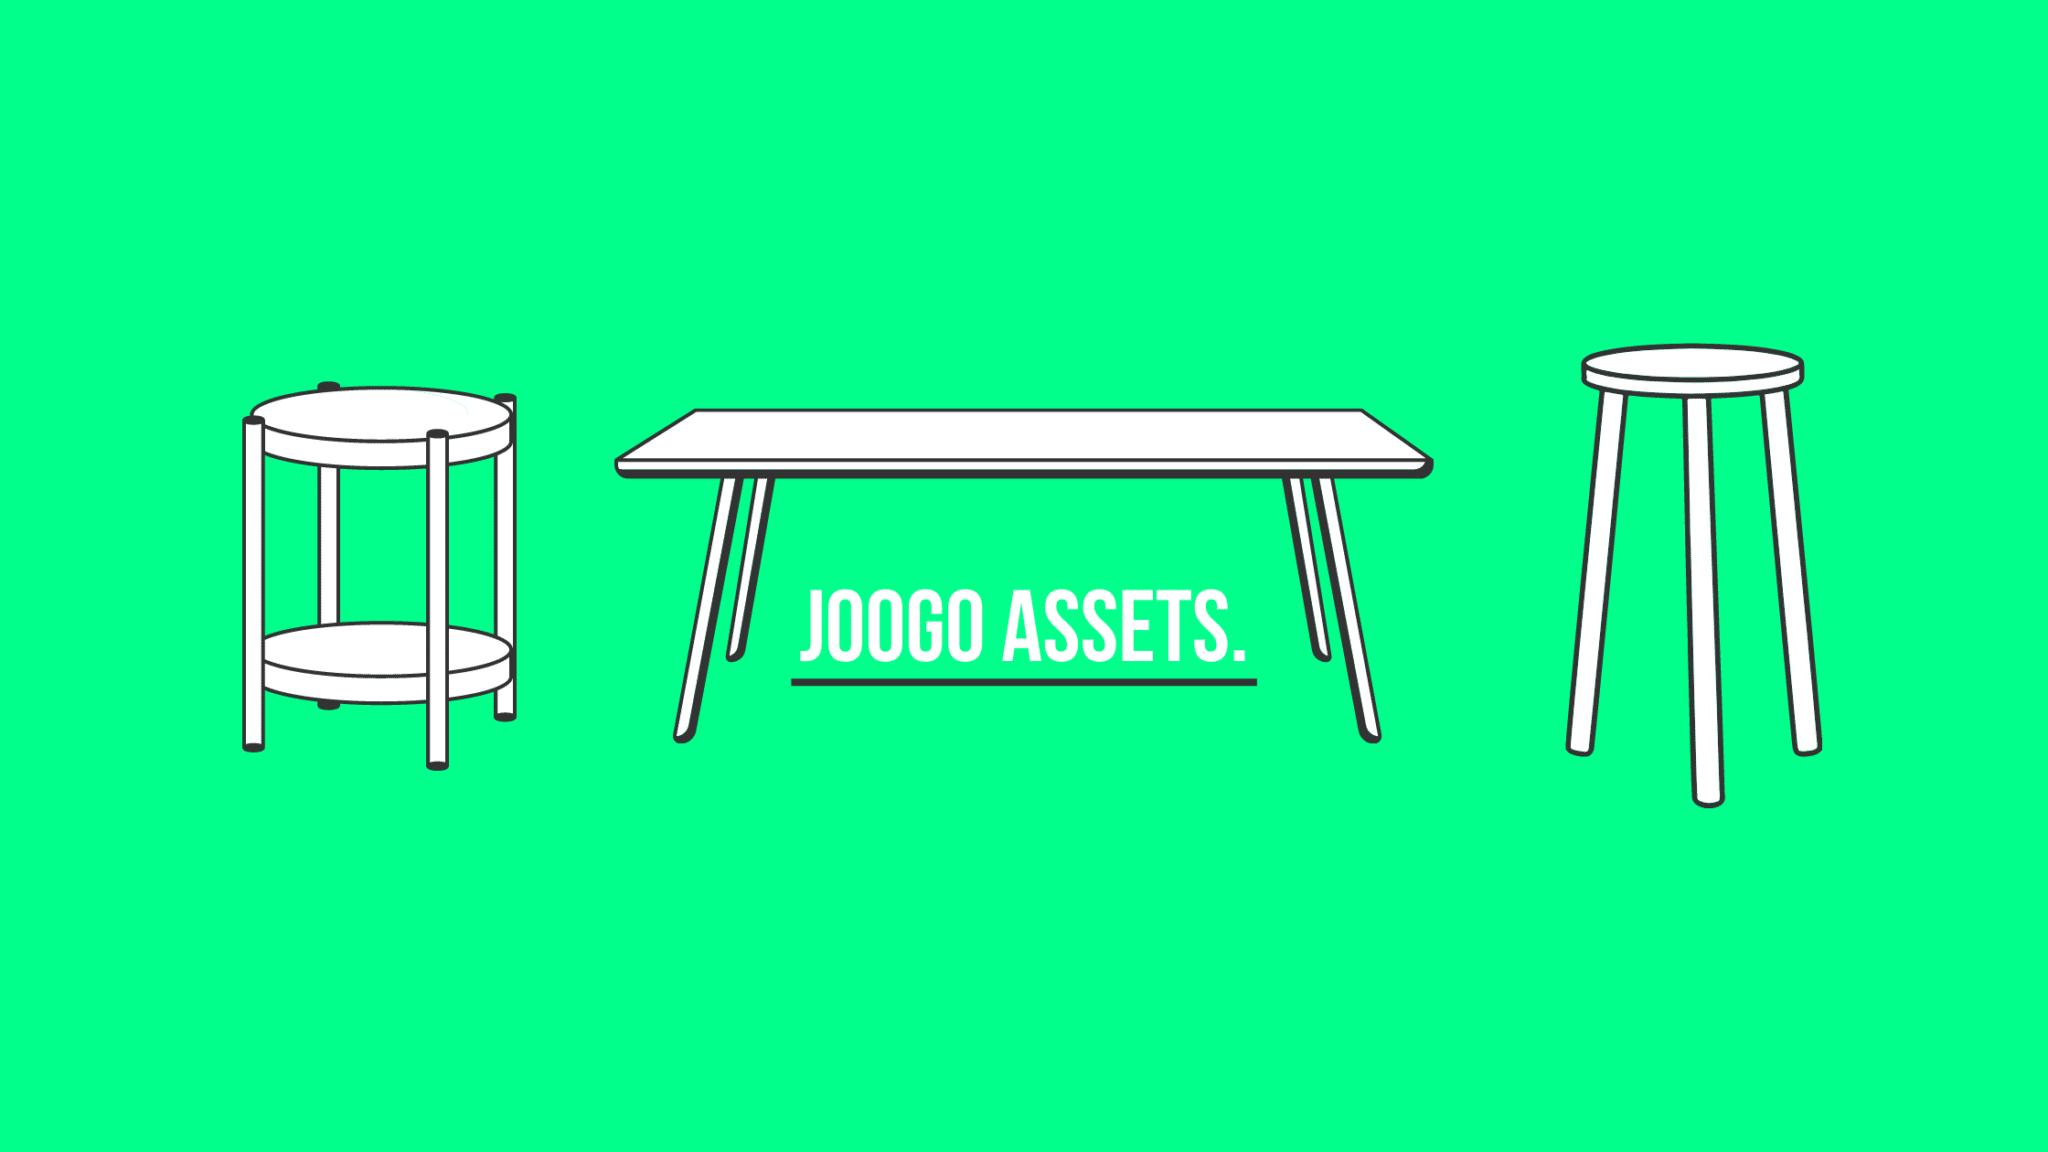 Joogo Assets